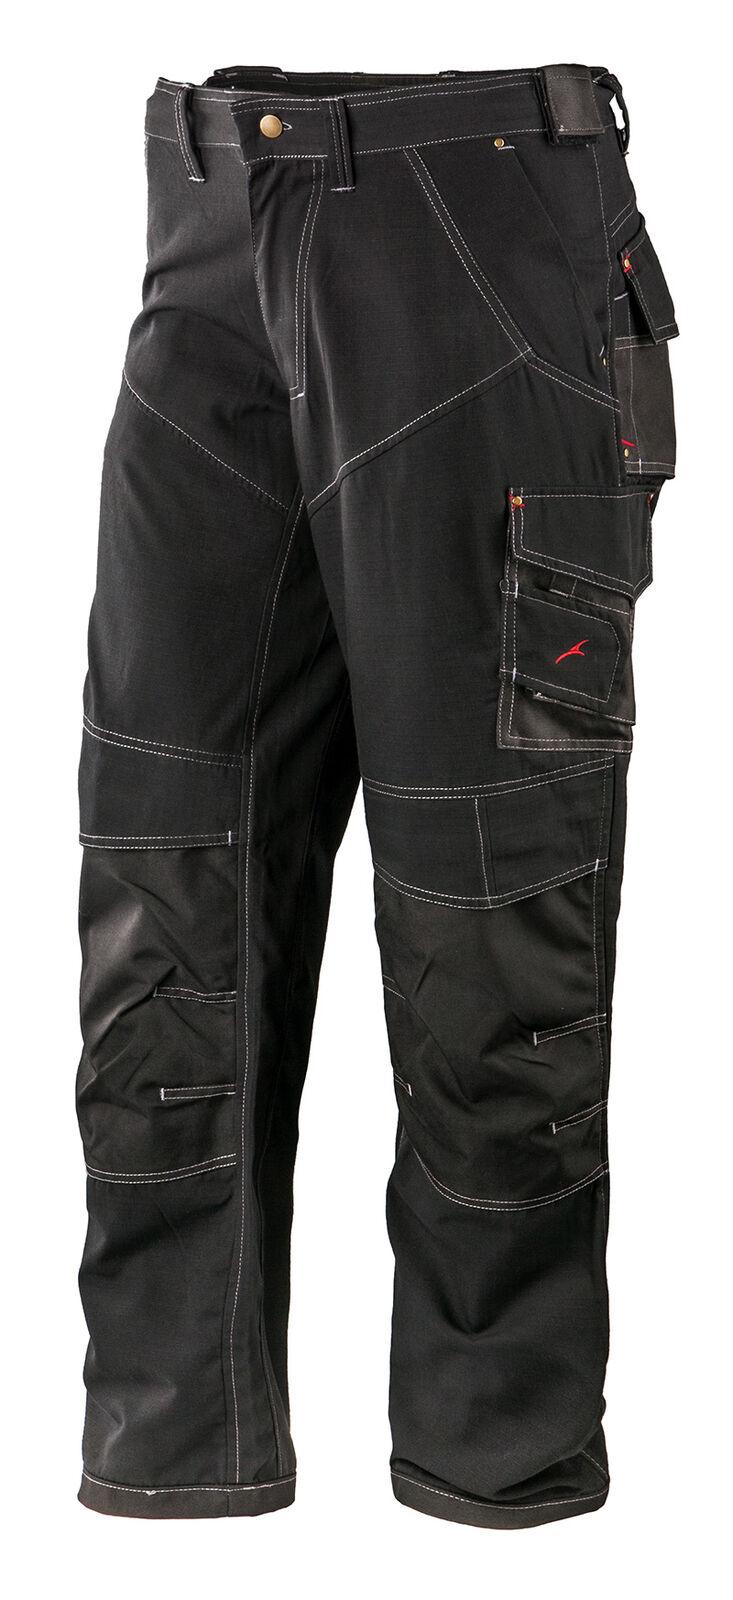 Pantaloni Federale Freestyle SR-MODERNI FORMA-ì resistenti-Nero